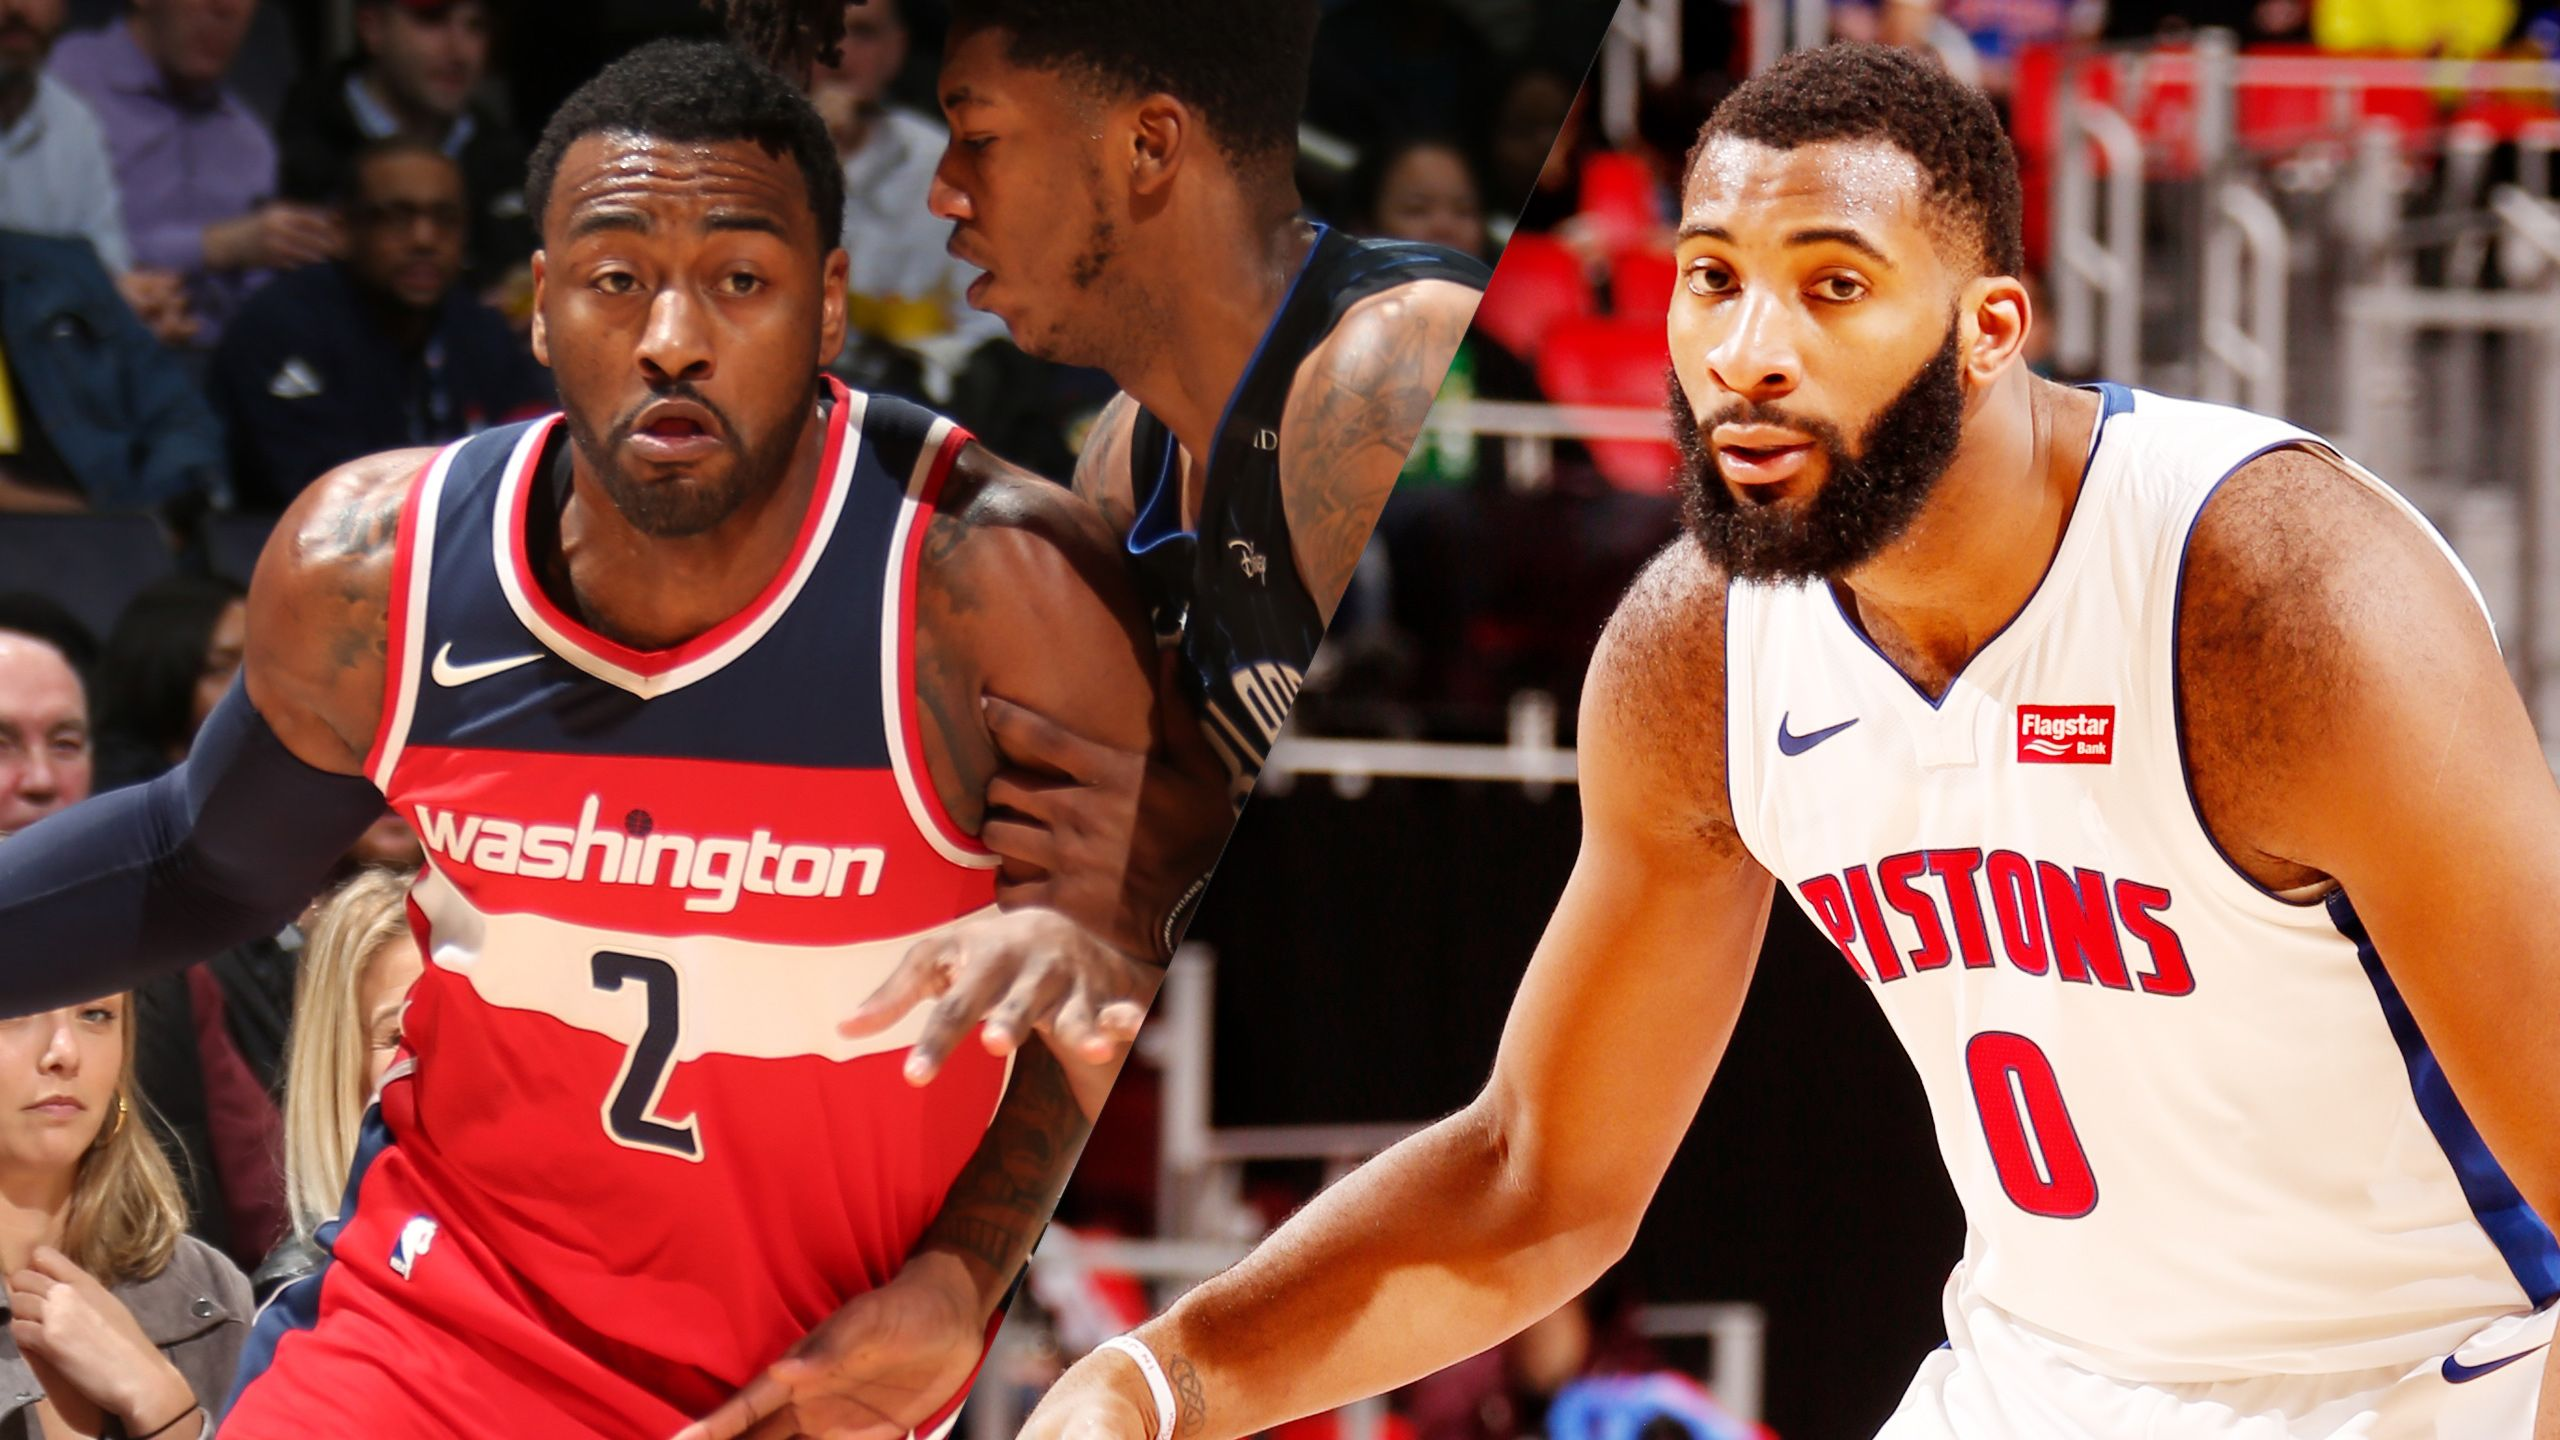 Washington Wizards vs. Detroit Pistons